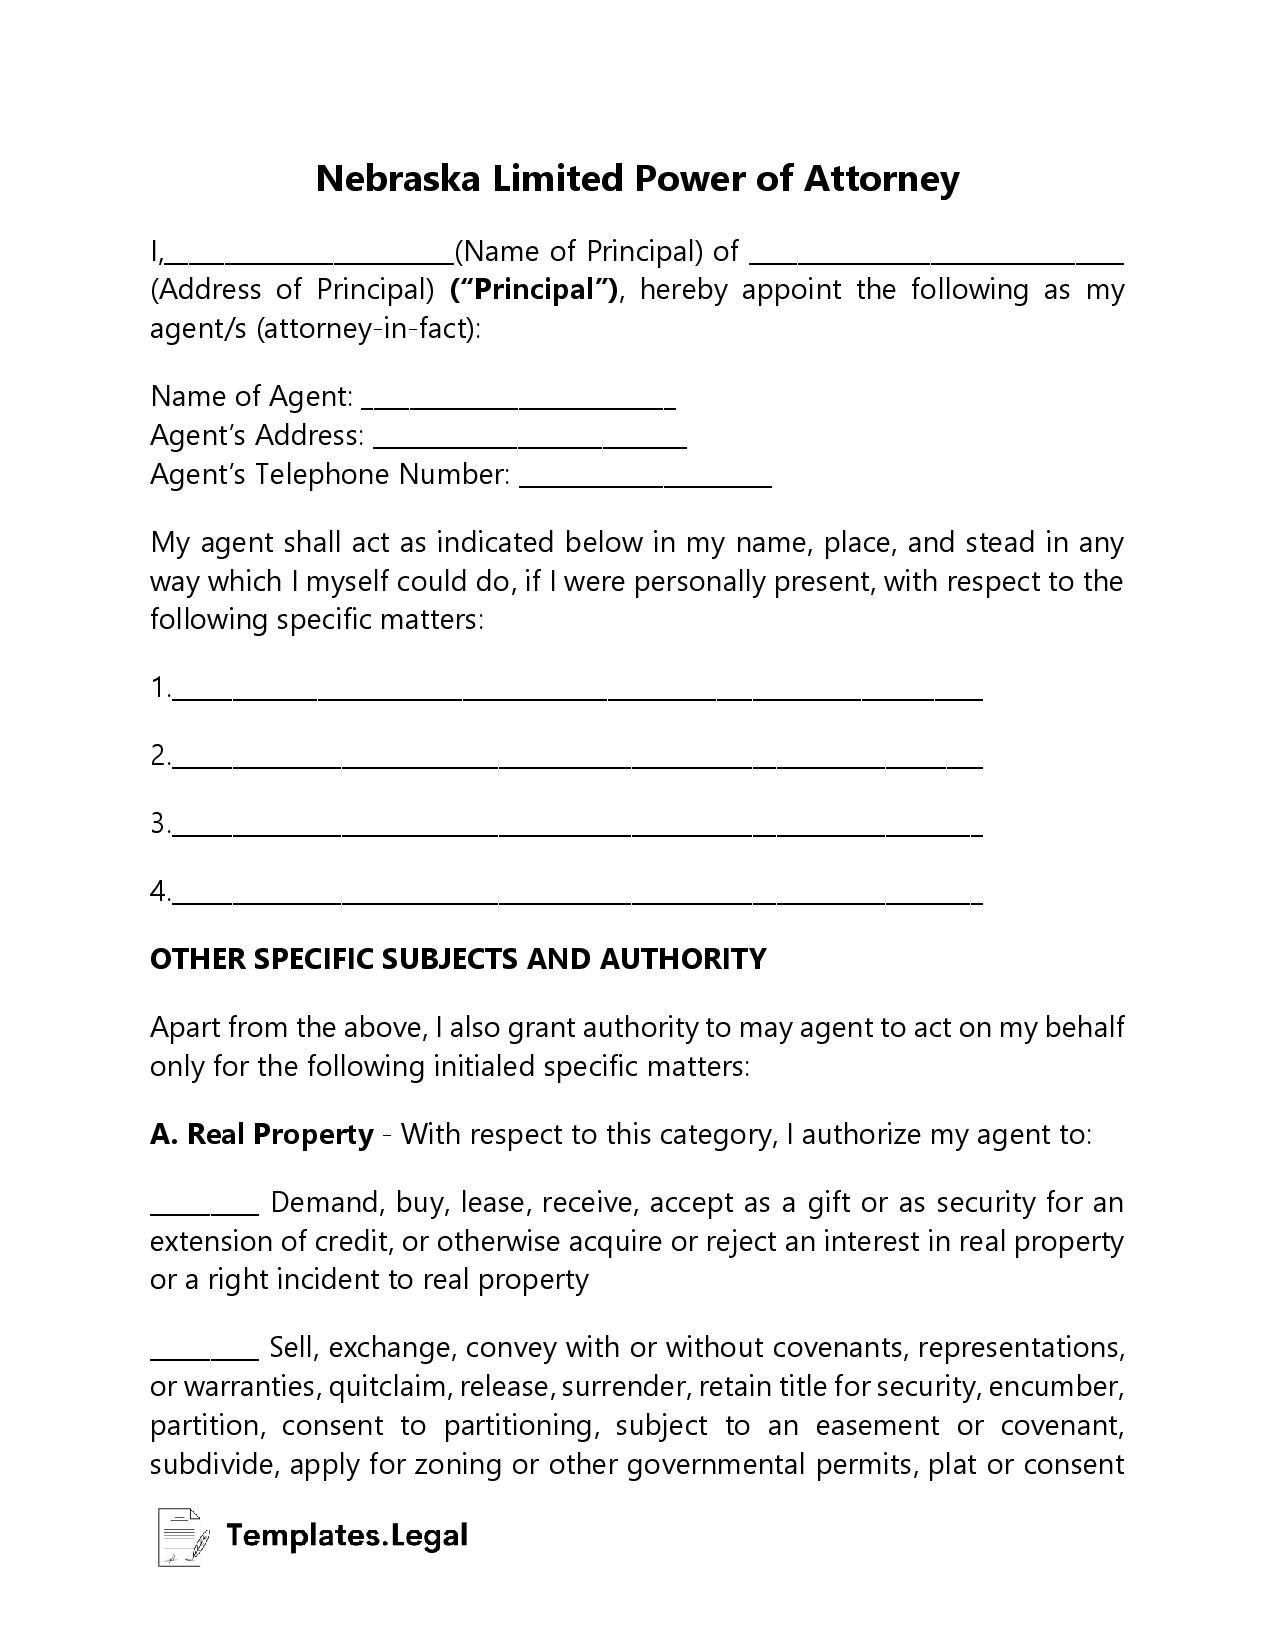 Nebraska Limited Power of Attorney - Templates.Legal